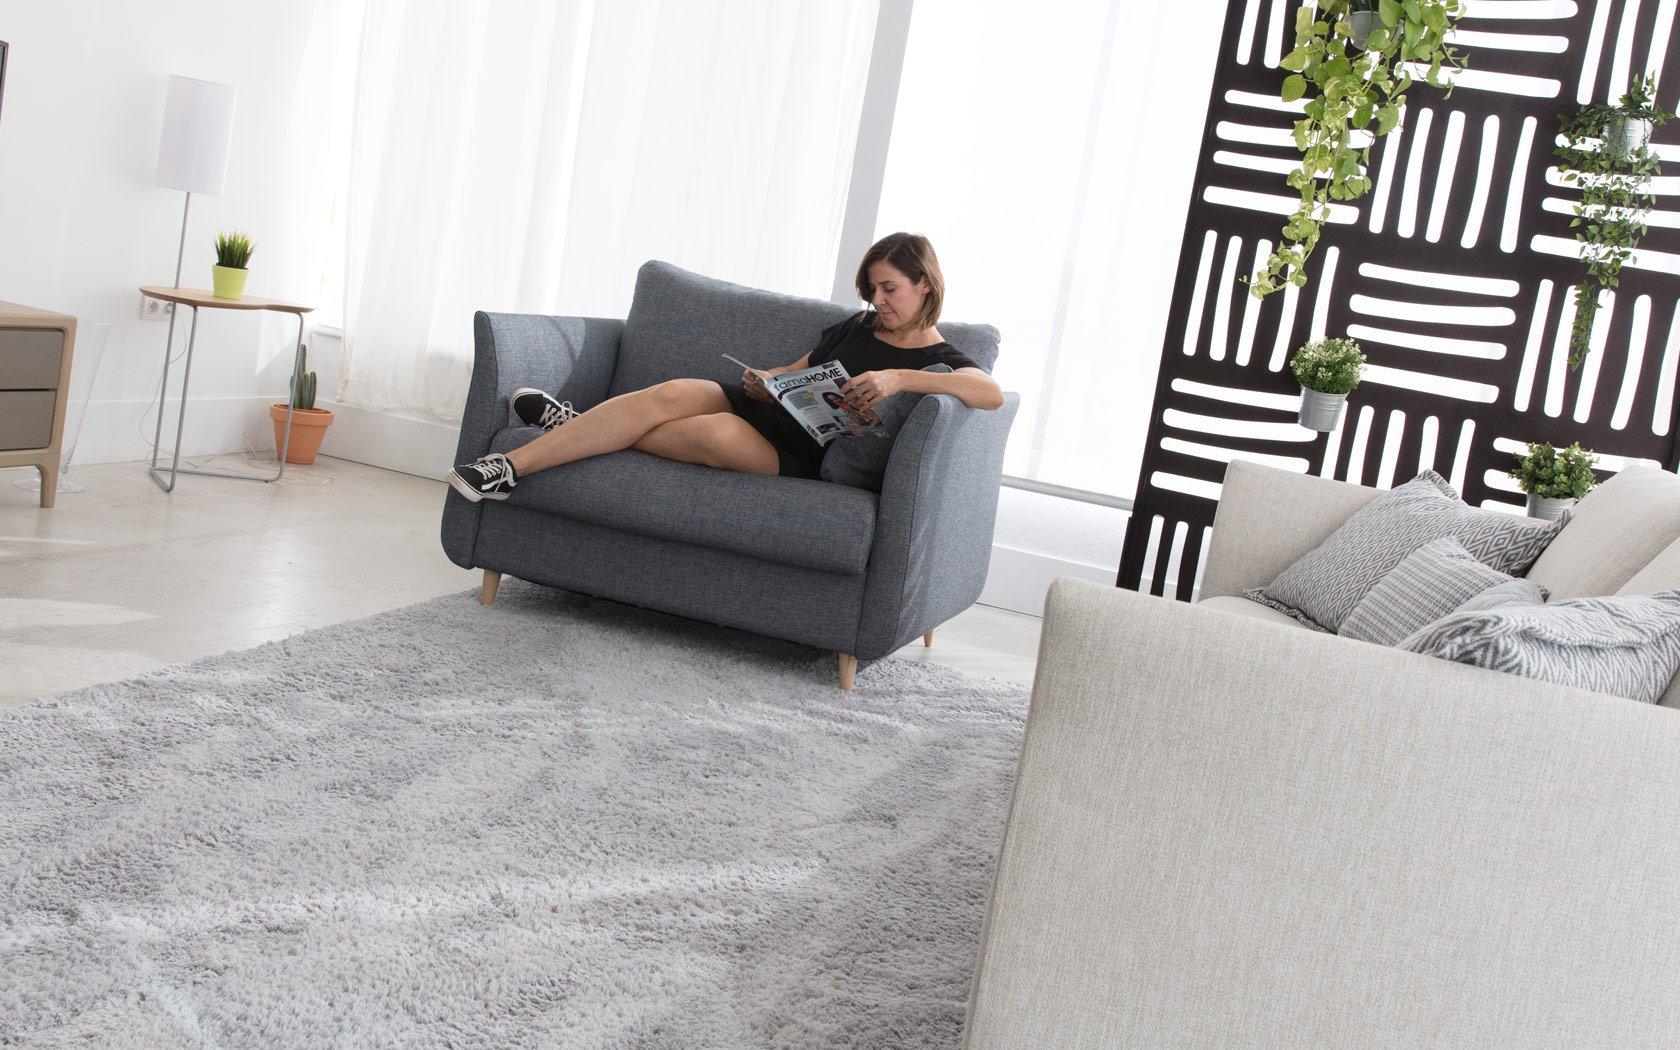 Helsinki sillón cama 2020 06